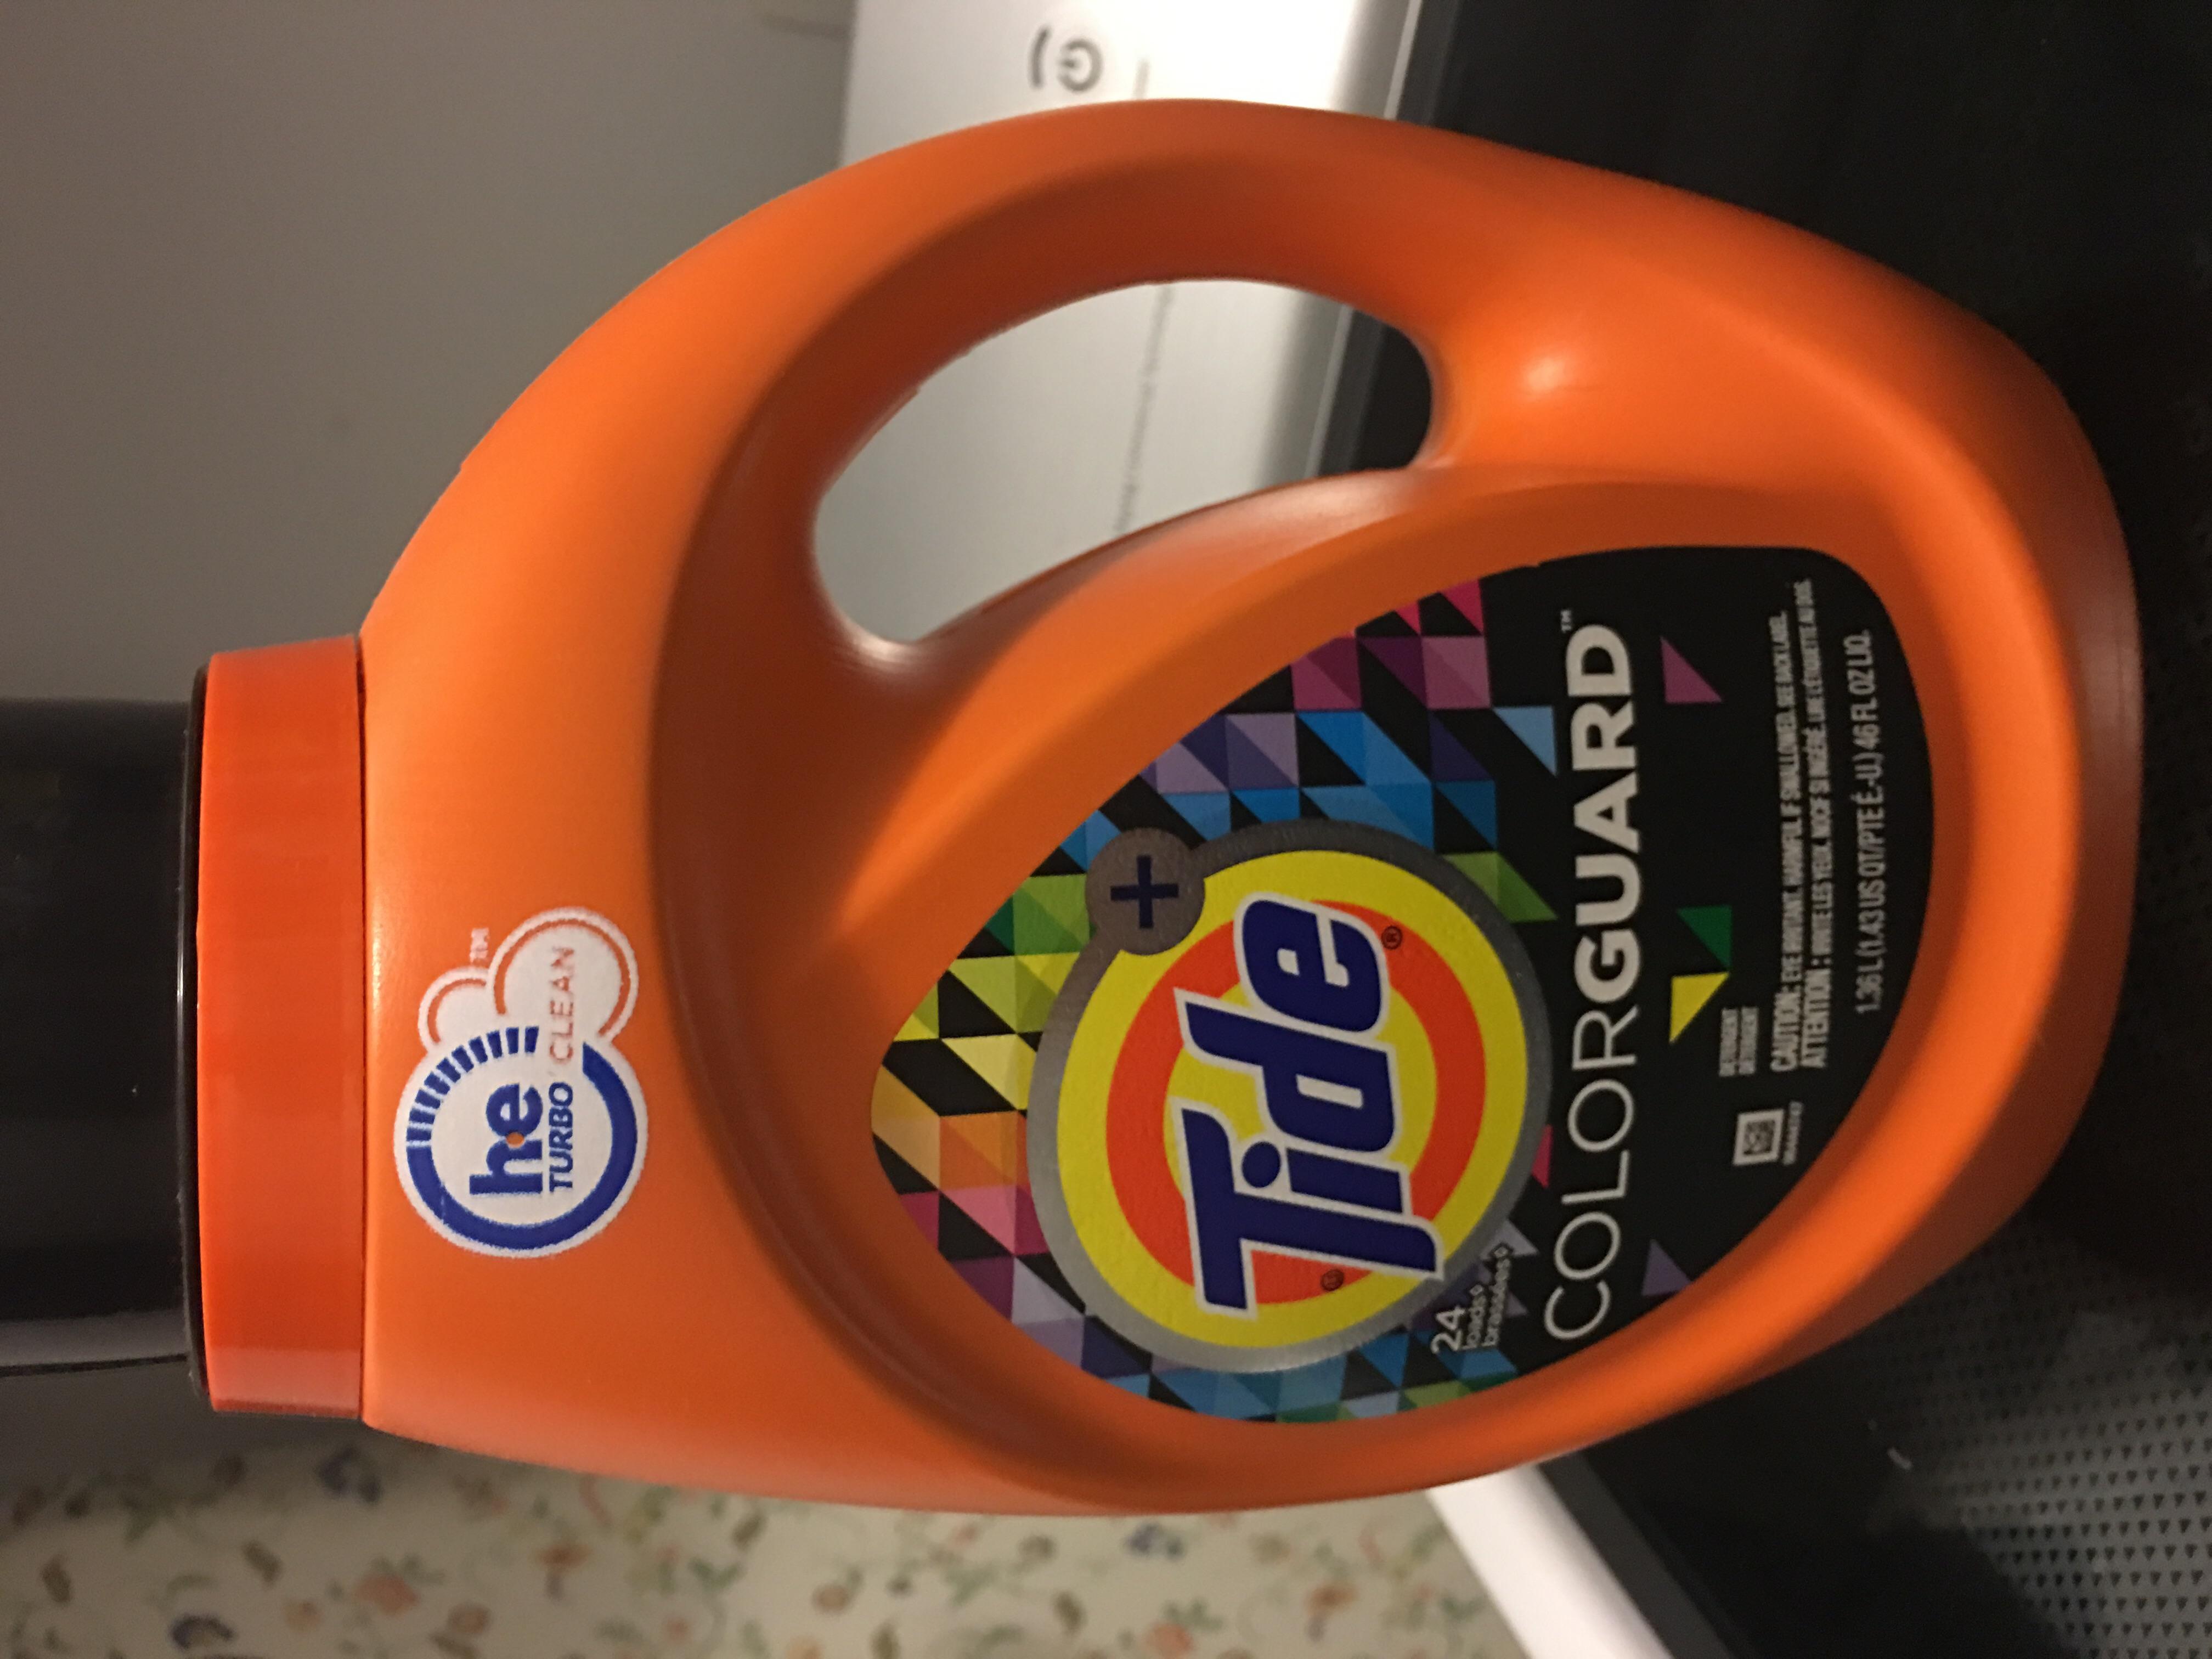 Tide Plus Colorguard Liquid Laundry Detergent uploaded by Elena K.